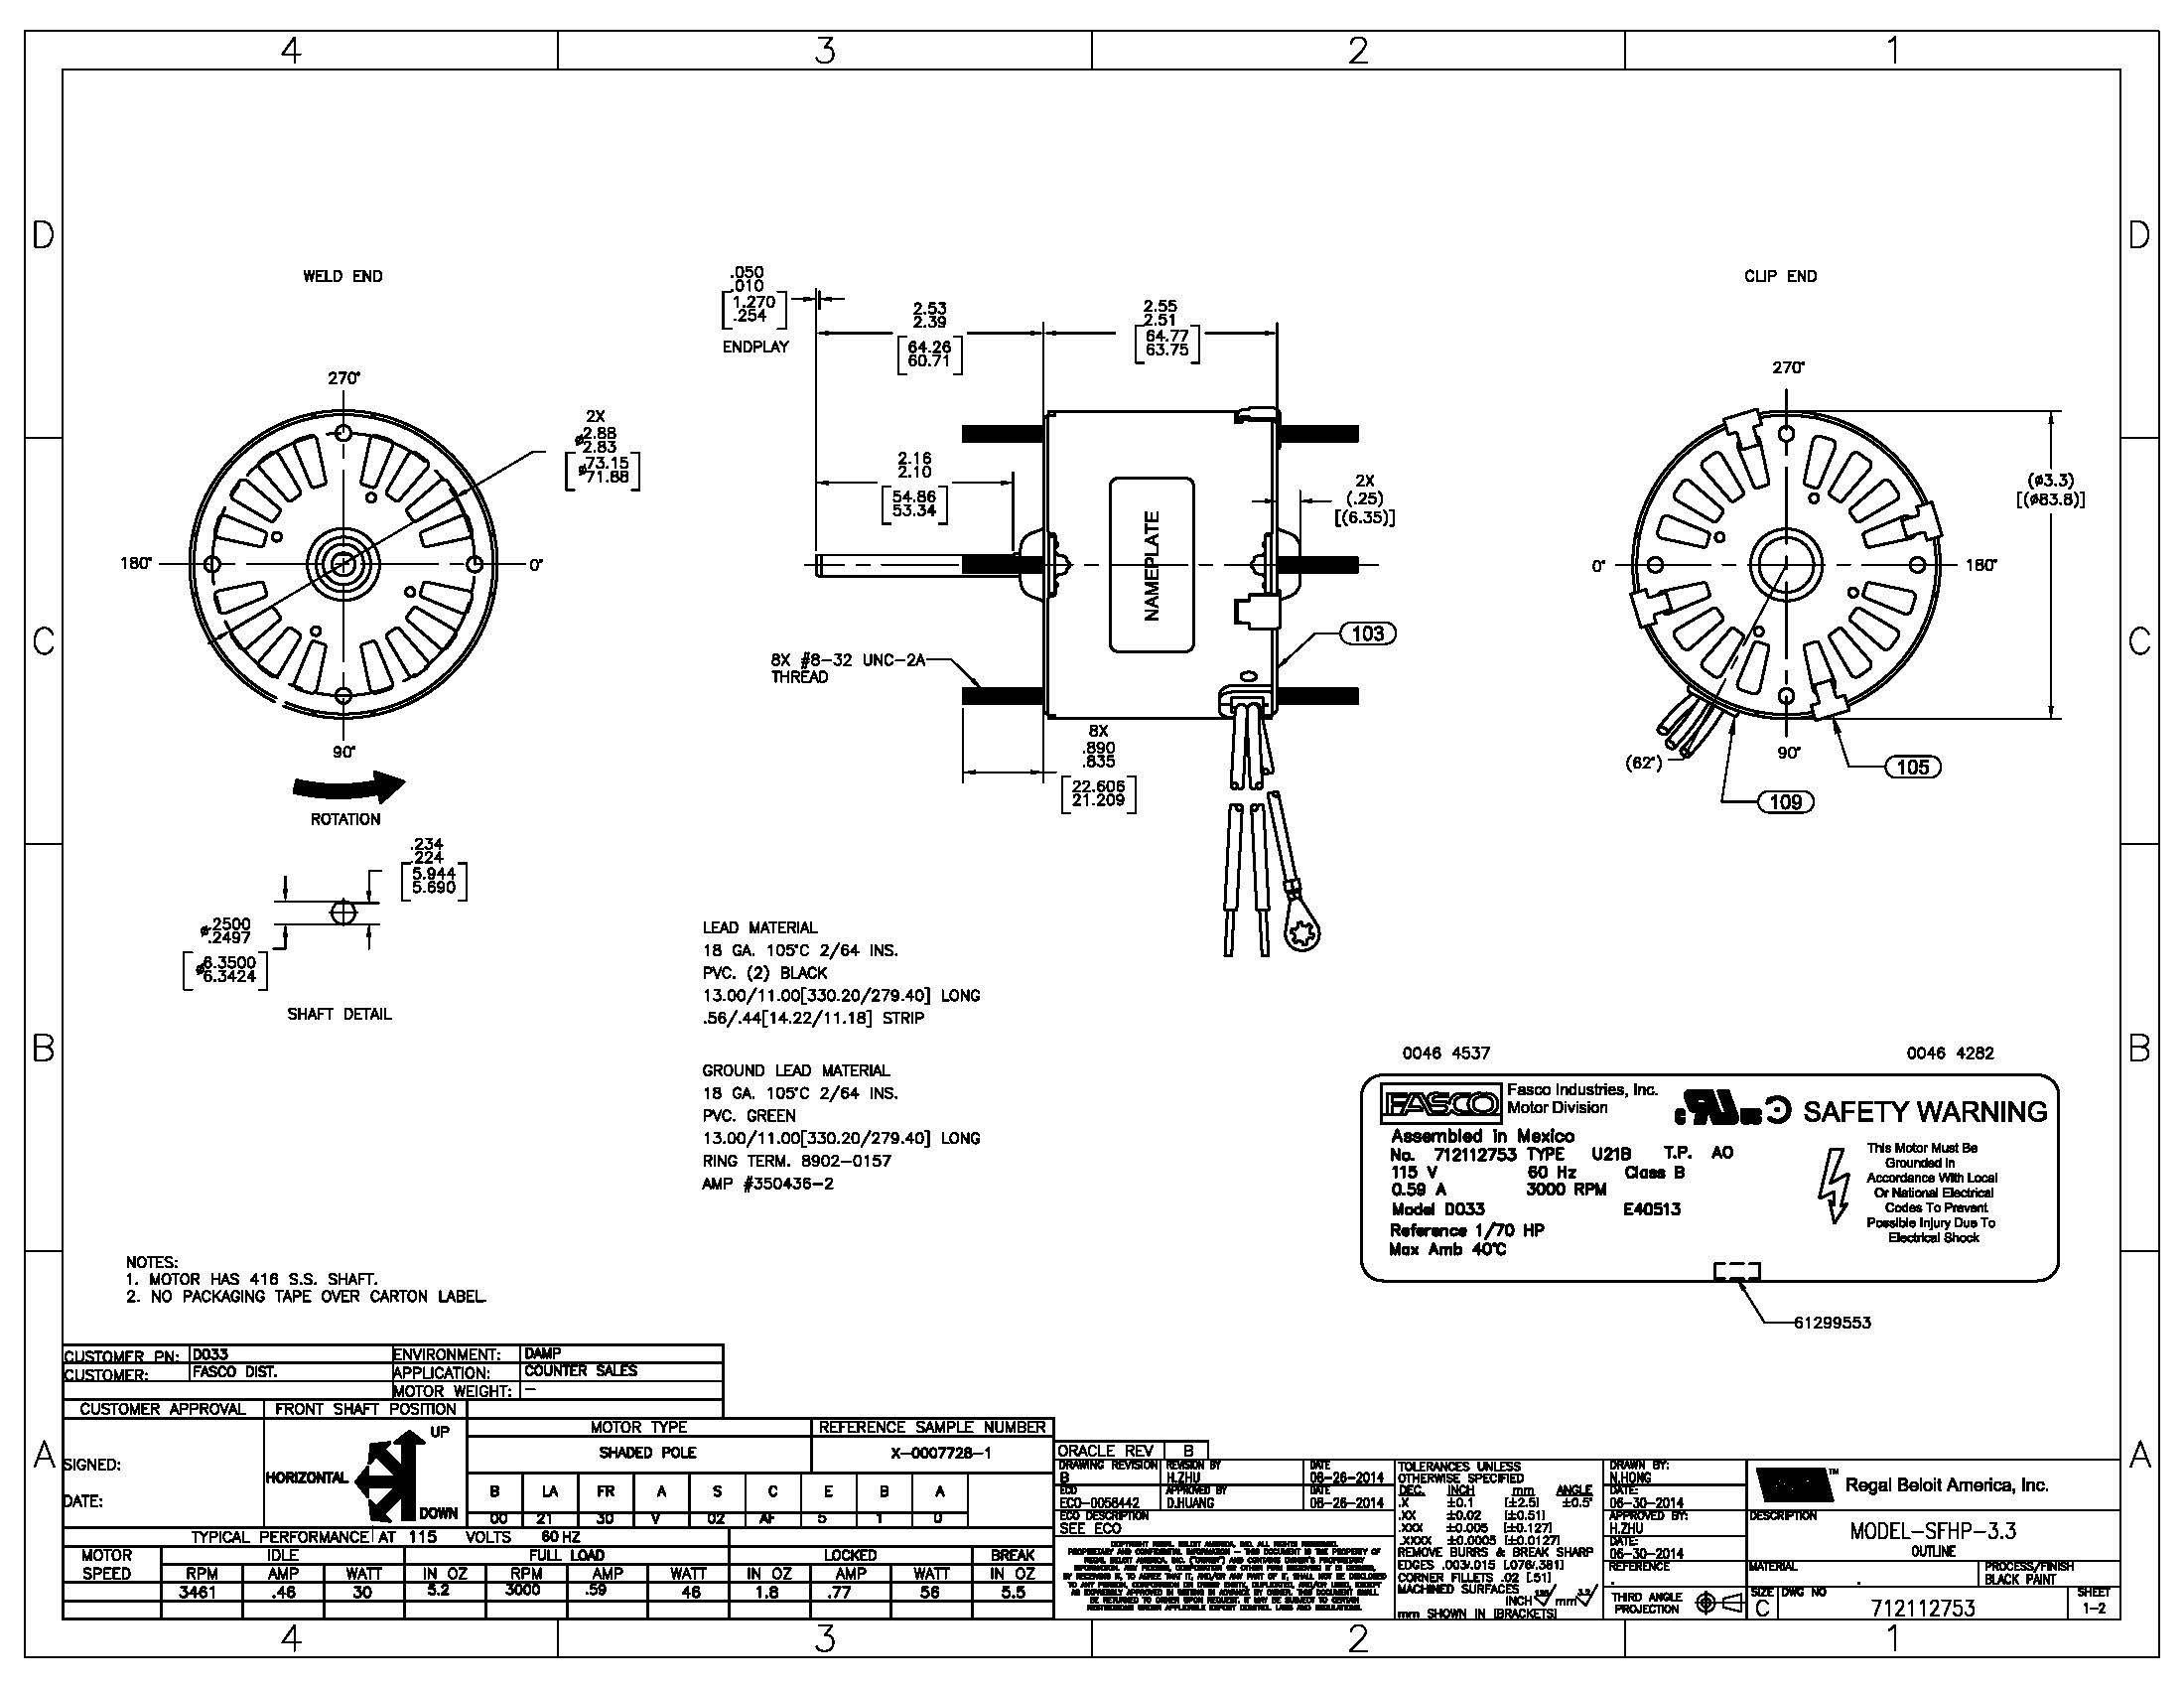 Gould Electric Motor Wiring Diagram | Wiring Diagram - Gould Century Motor Wiring Diagram